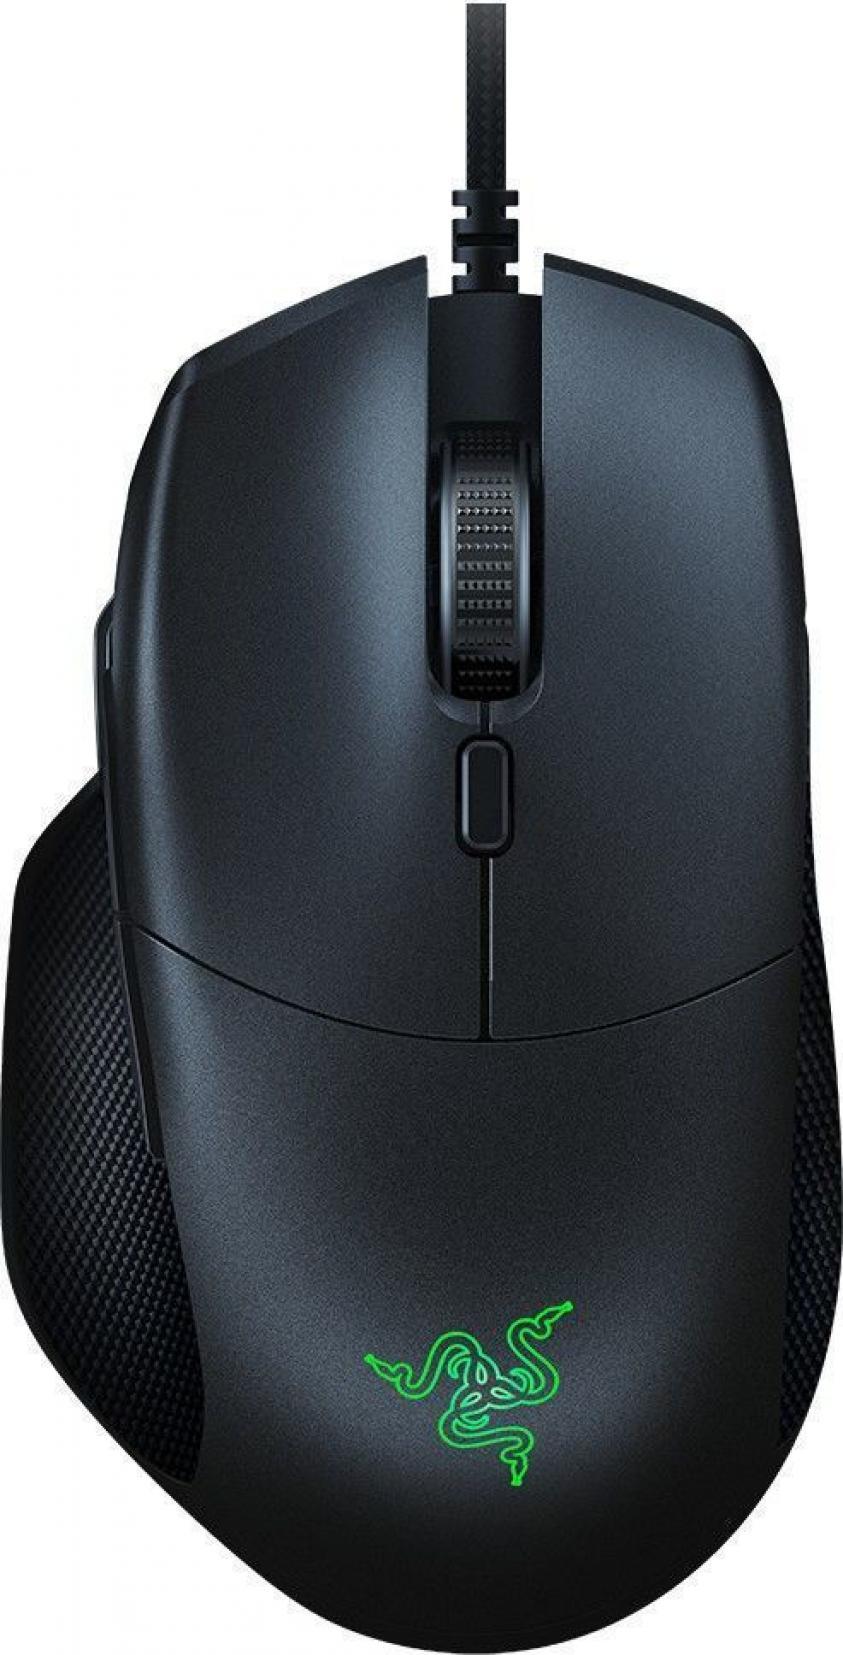 Gaming Mouse Razer Basilisk Essential Chroma (RZ01-02650100-R3M1)